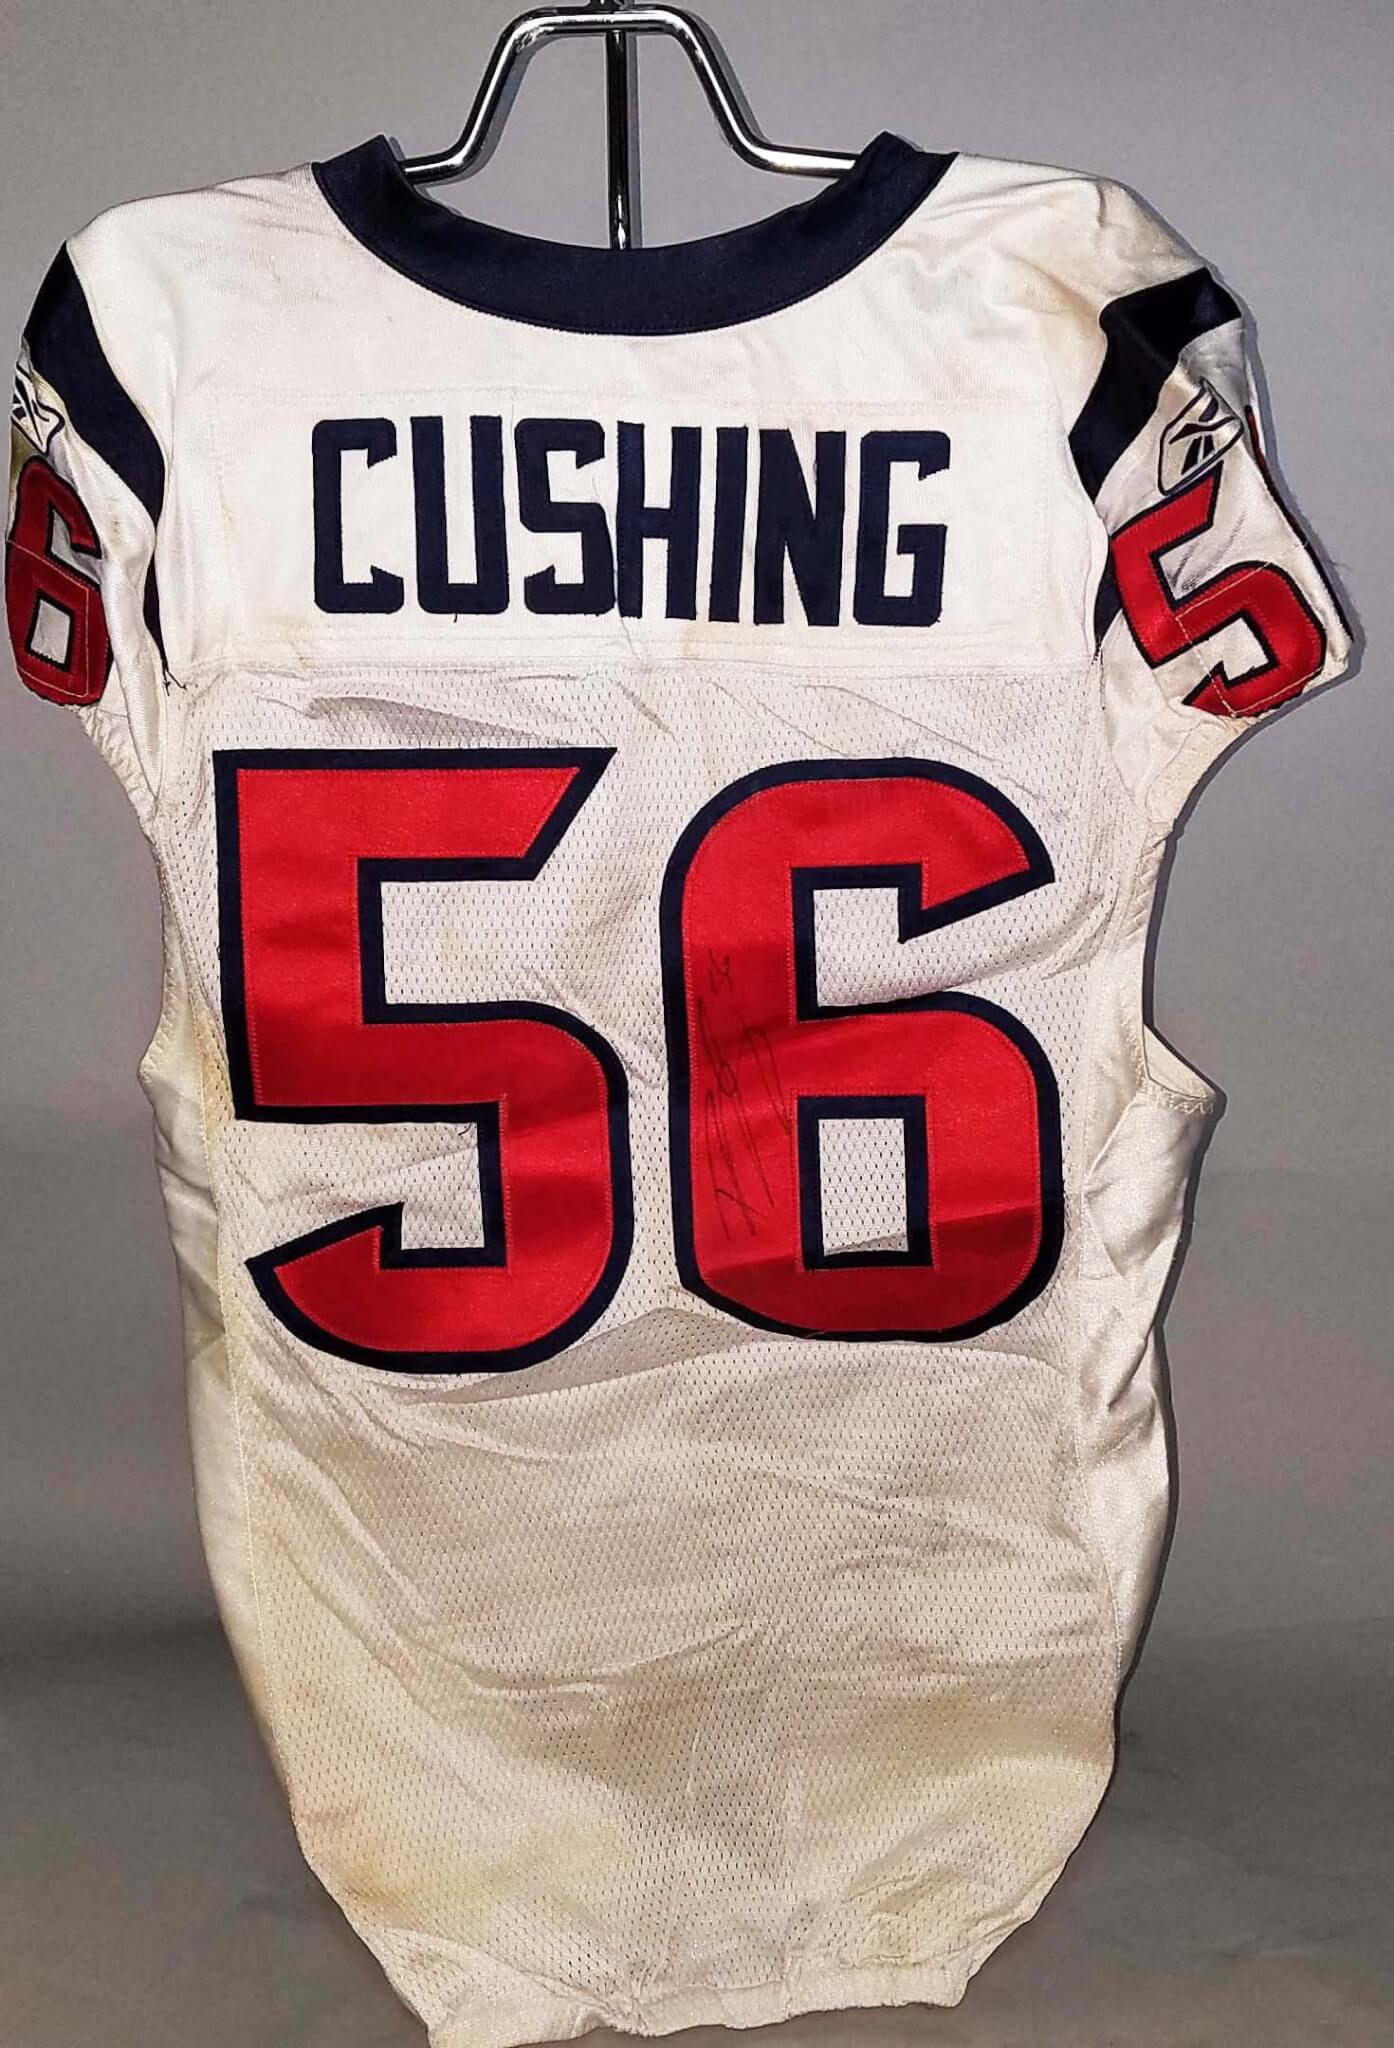 2011 Brian Cushing Game-Worn, Signed Houston Texans Jersey - COA 100% Team & PSA/DNA